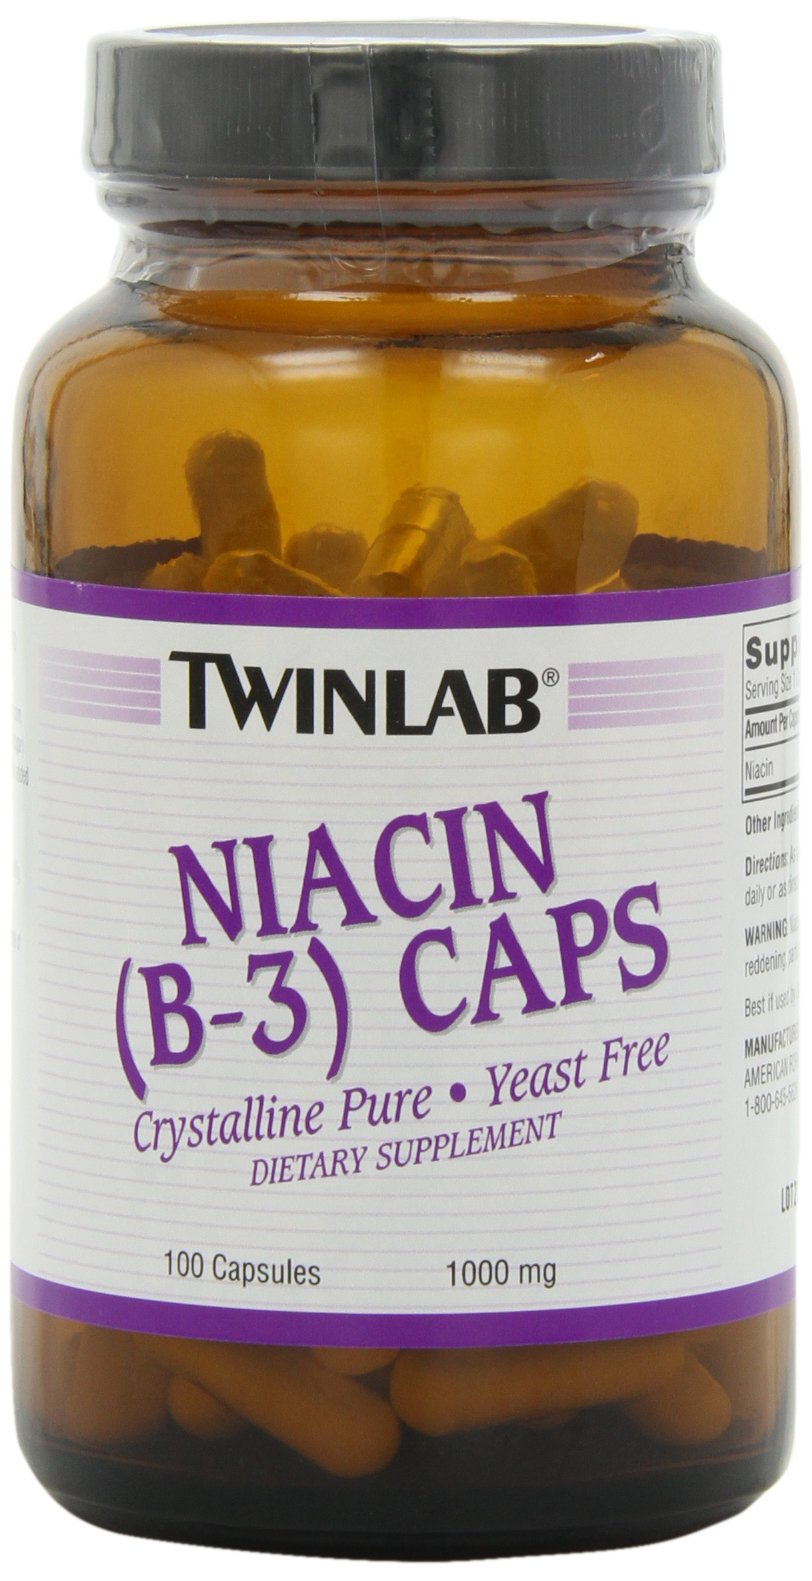 Twinlab Niacin (B-3) 1000mg, 100 Capsules (Pack of 3) by Twinlab